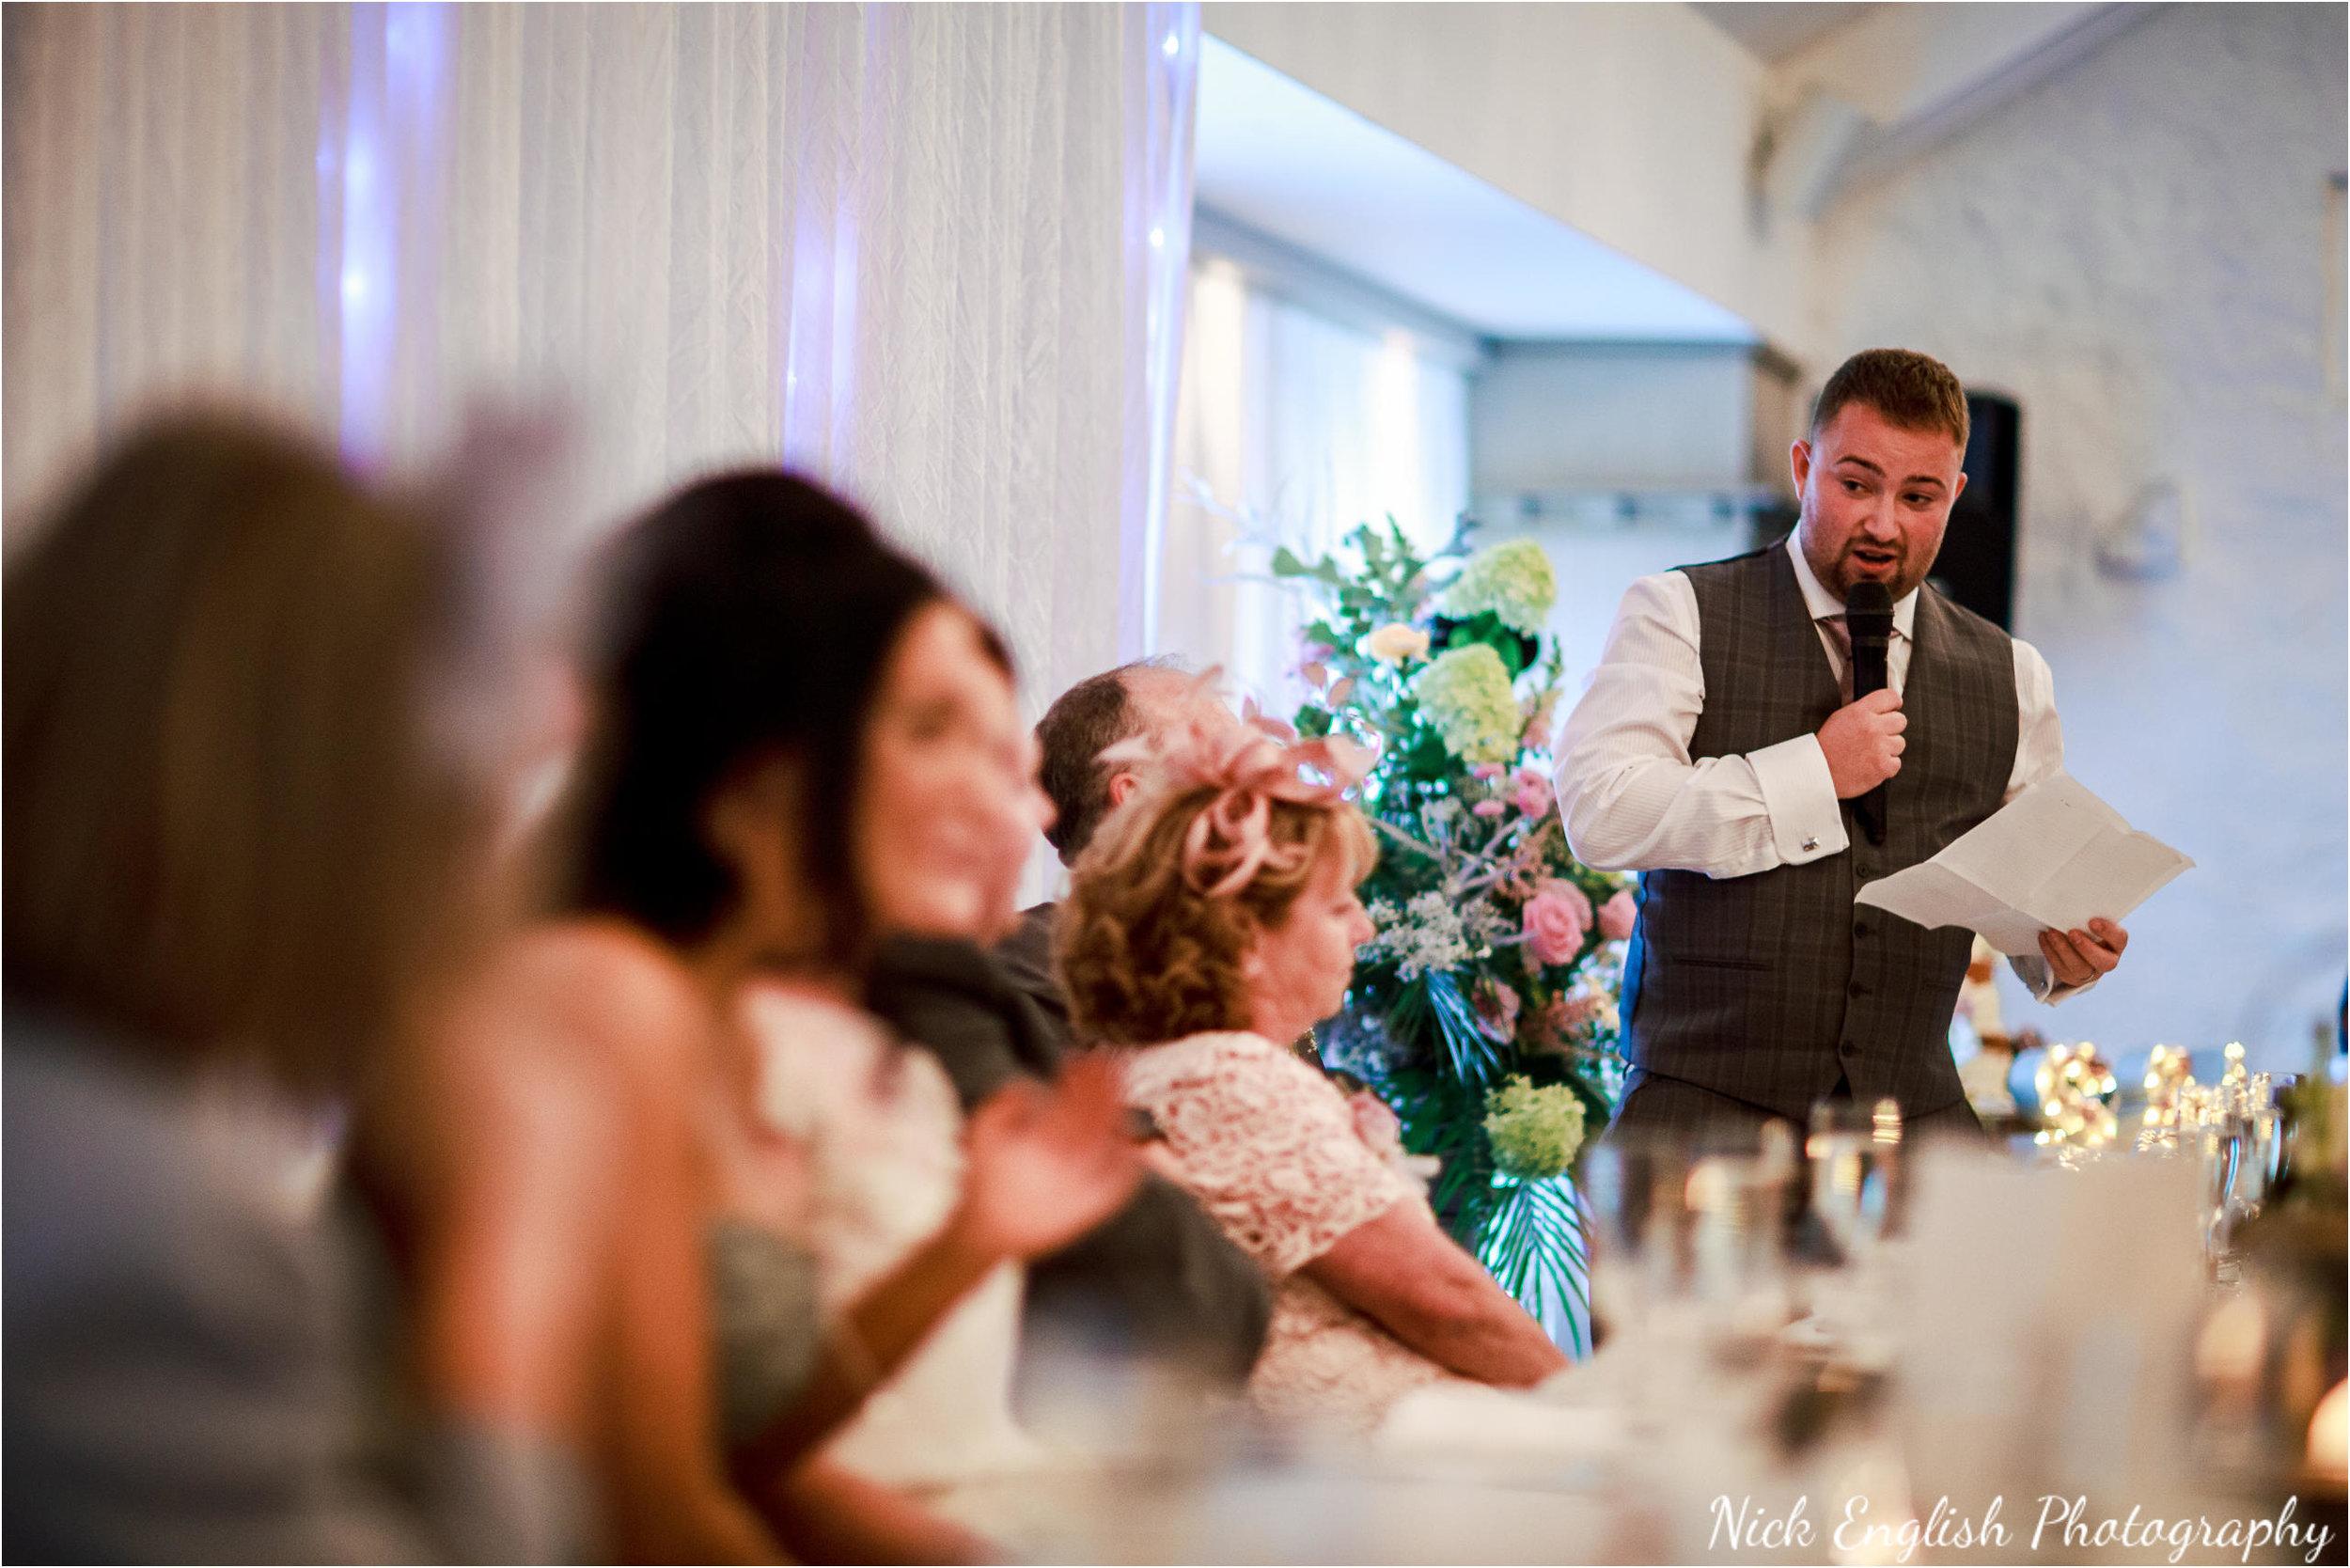 Stacey-Ash-Wedding-Photographs-Stanley-House-Preston-Lancashire-180.jpg